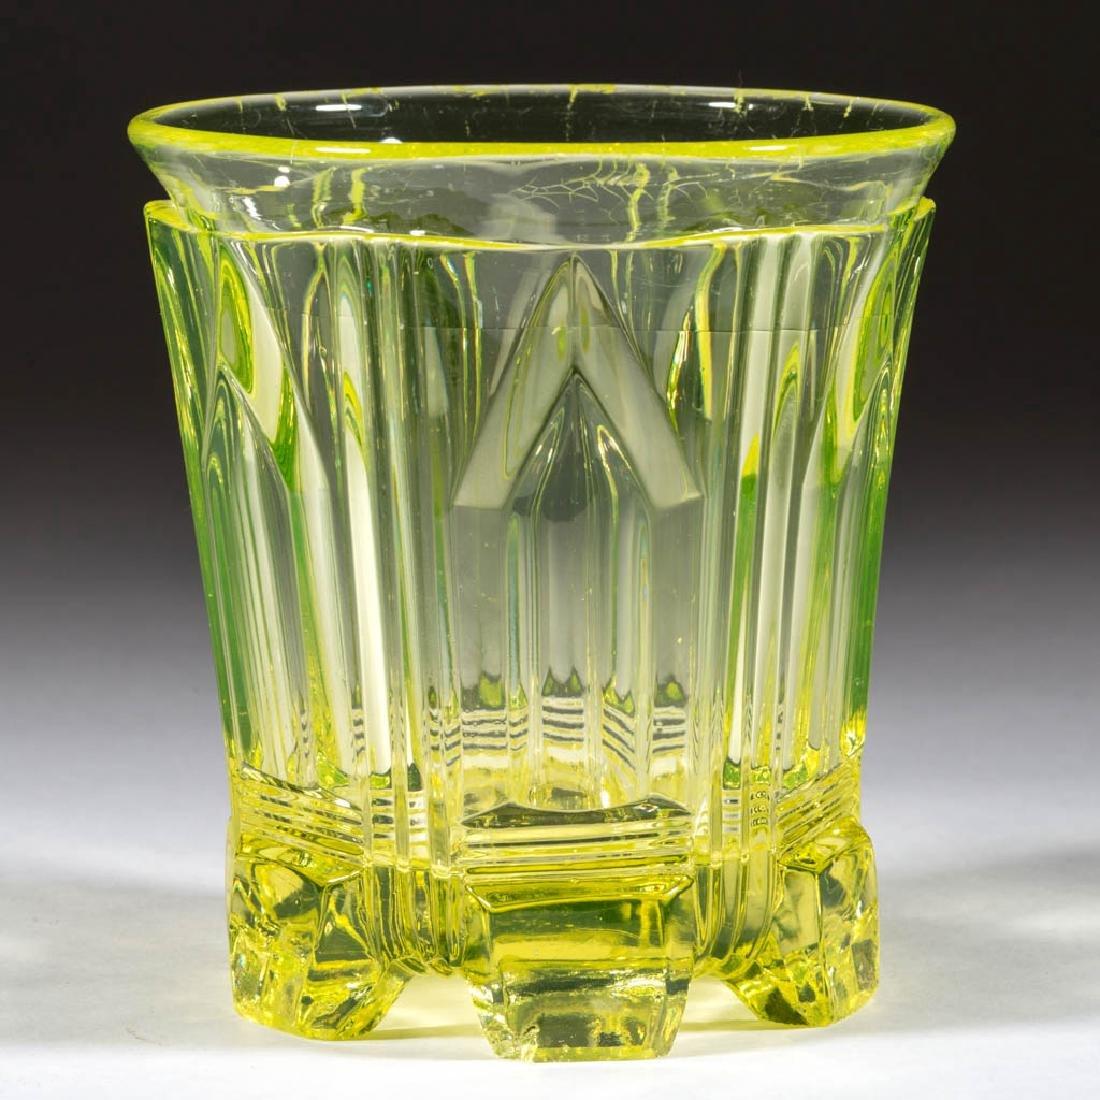 UNIDENTIFIED PRESSED FLINT GLASS TUMBLER